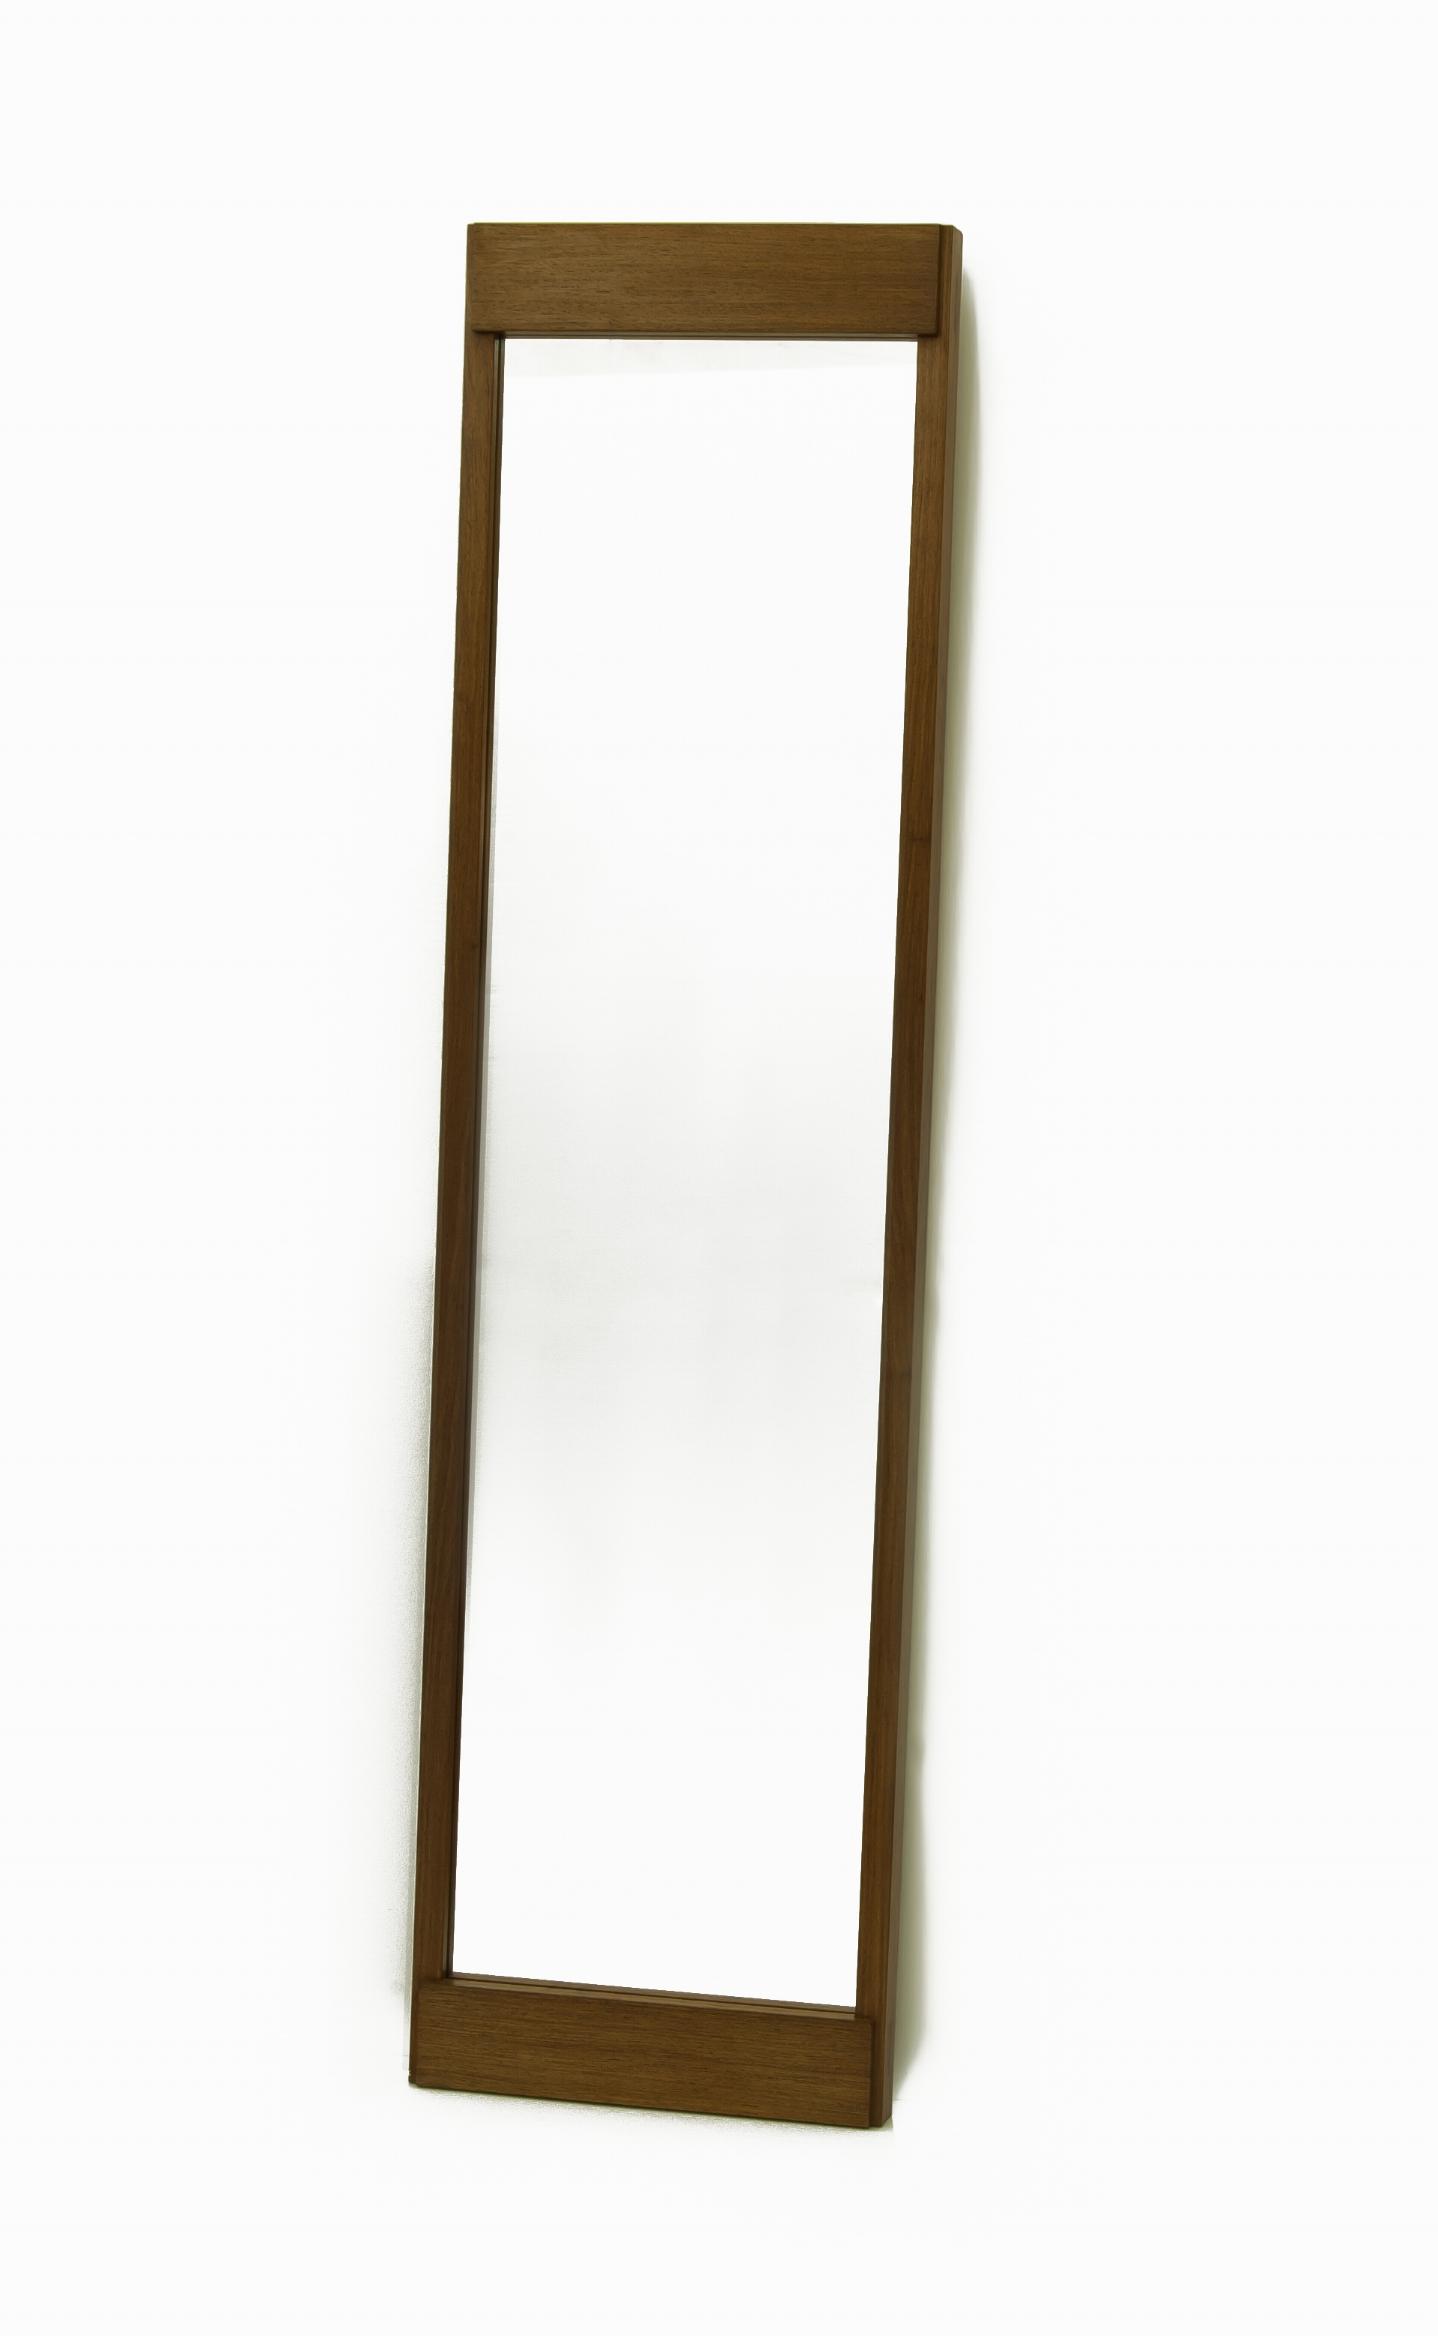 ....Bespoke Modern furniture : Mirror..特别定制现代家具: 镜子....